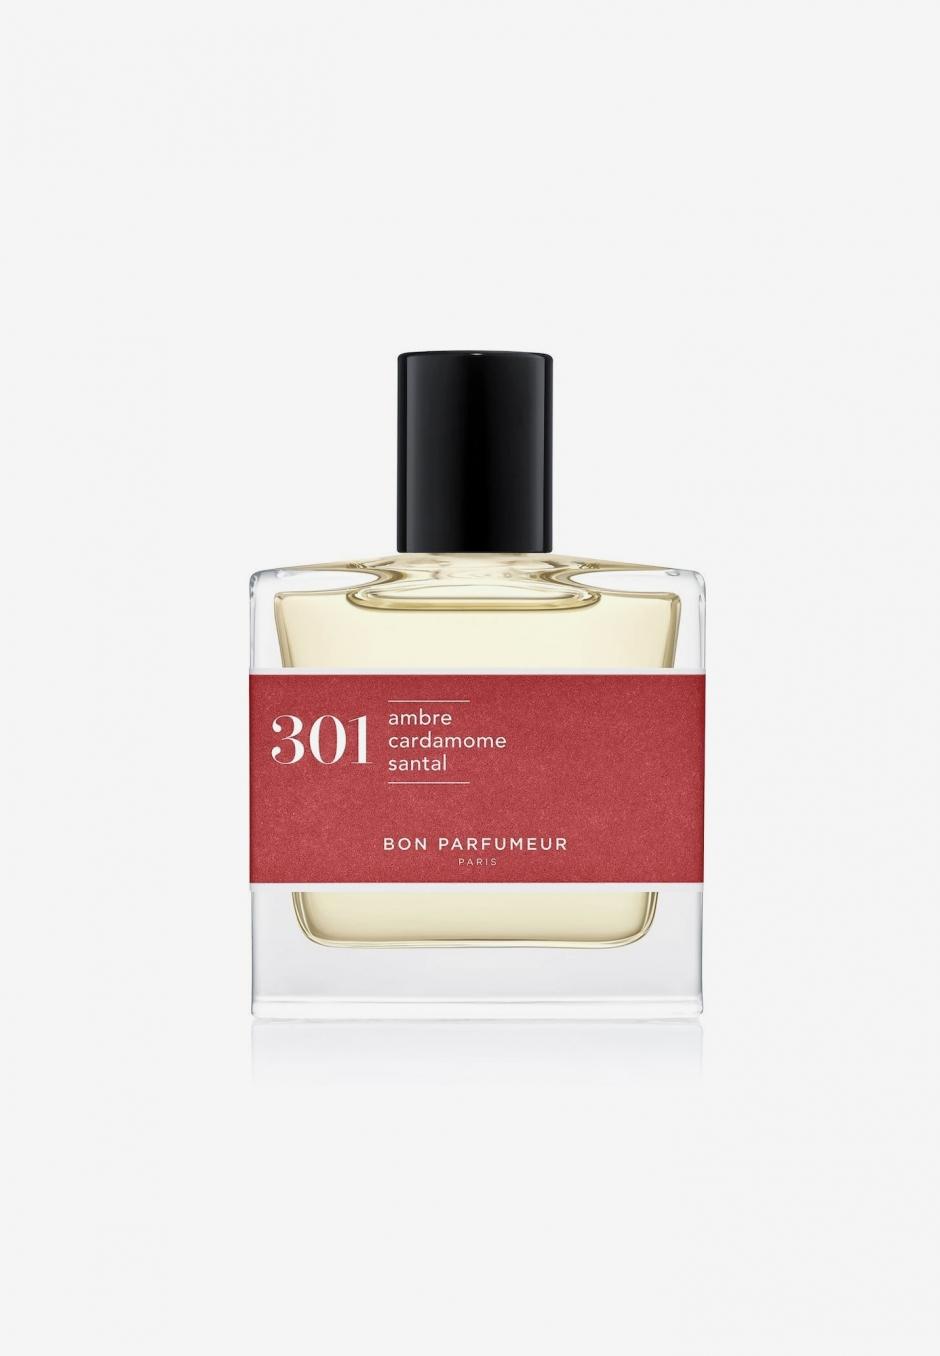 Bon Parfumeur EdP 301: sandalwood/amber/cardamom 30ml